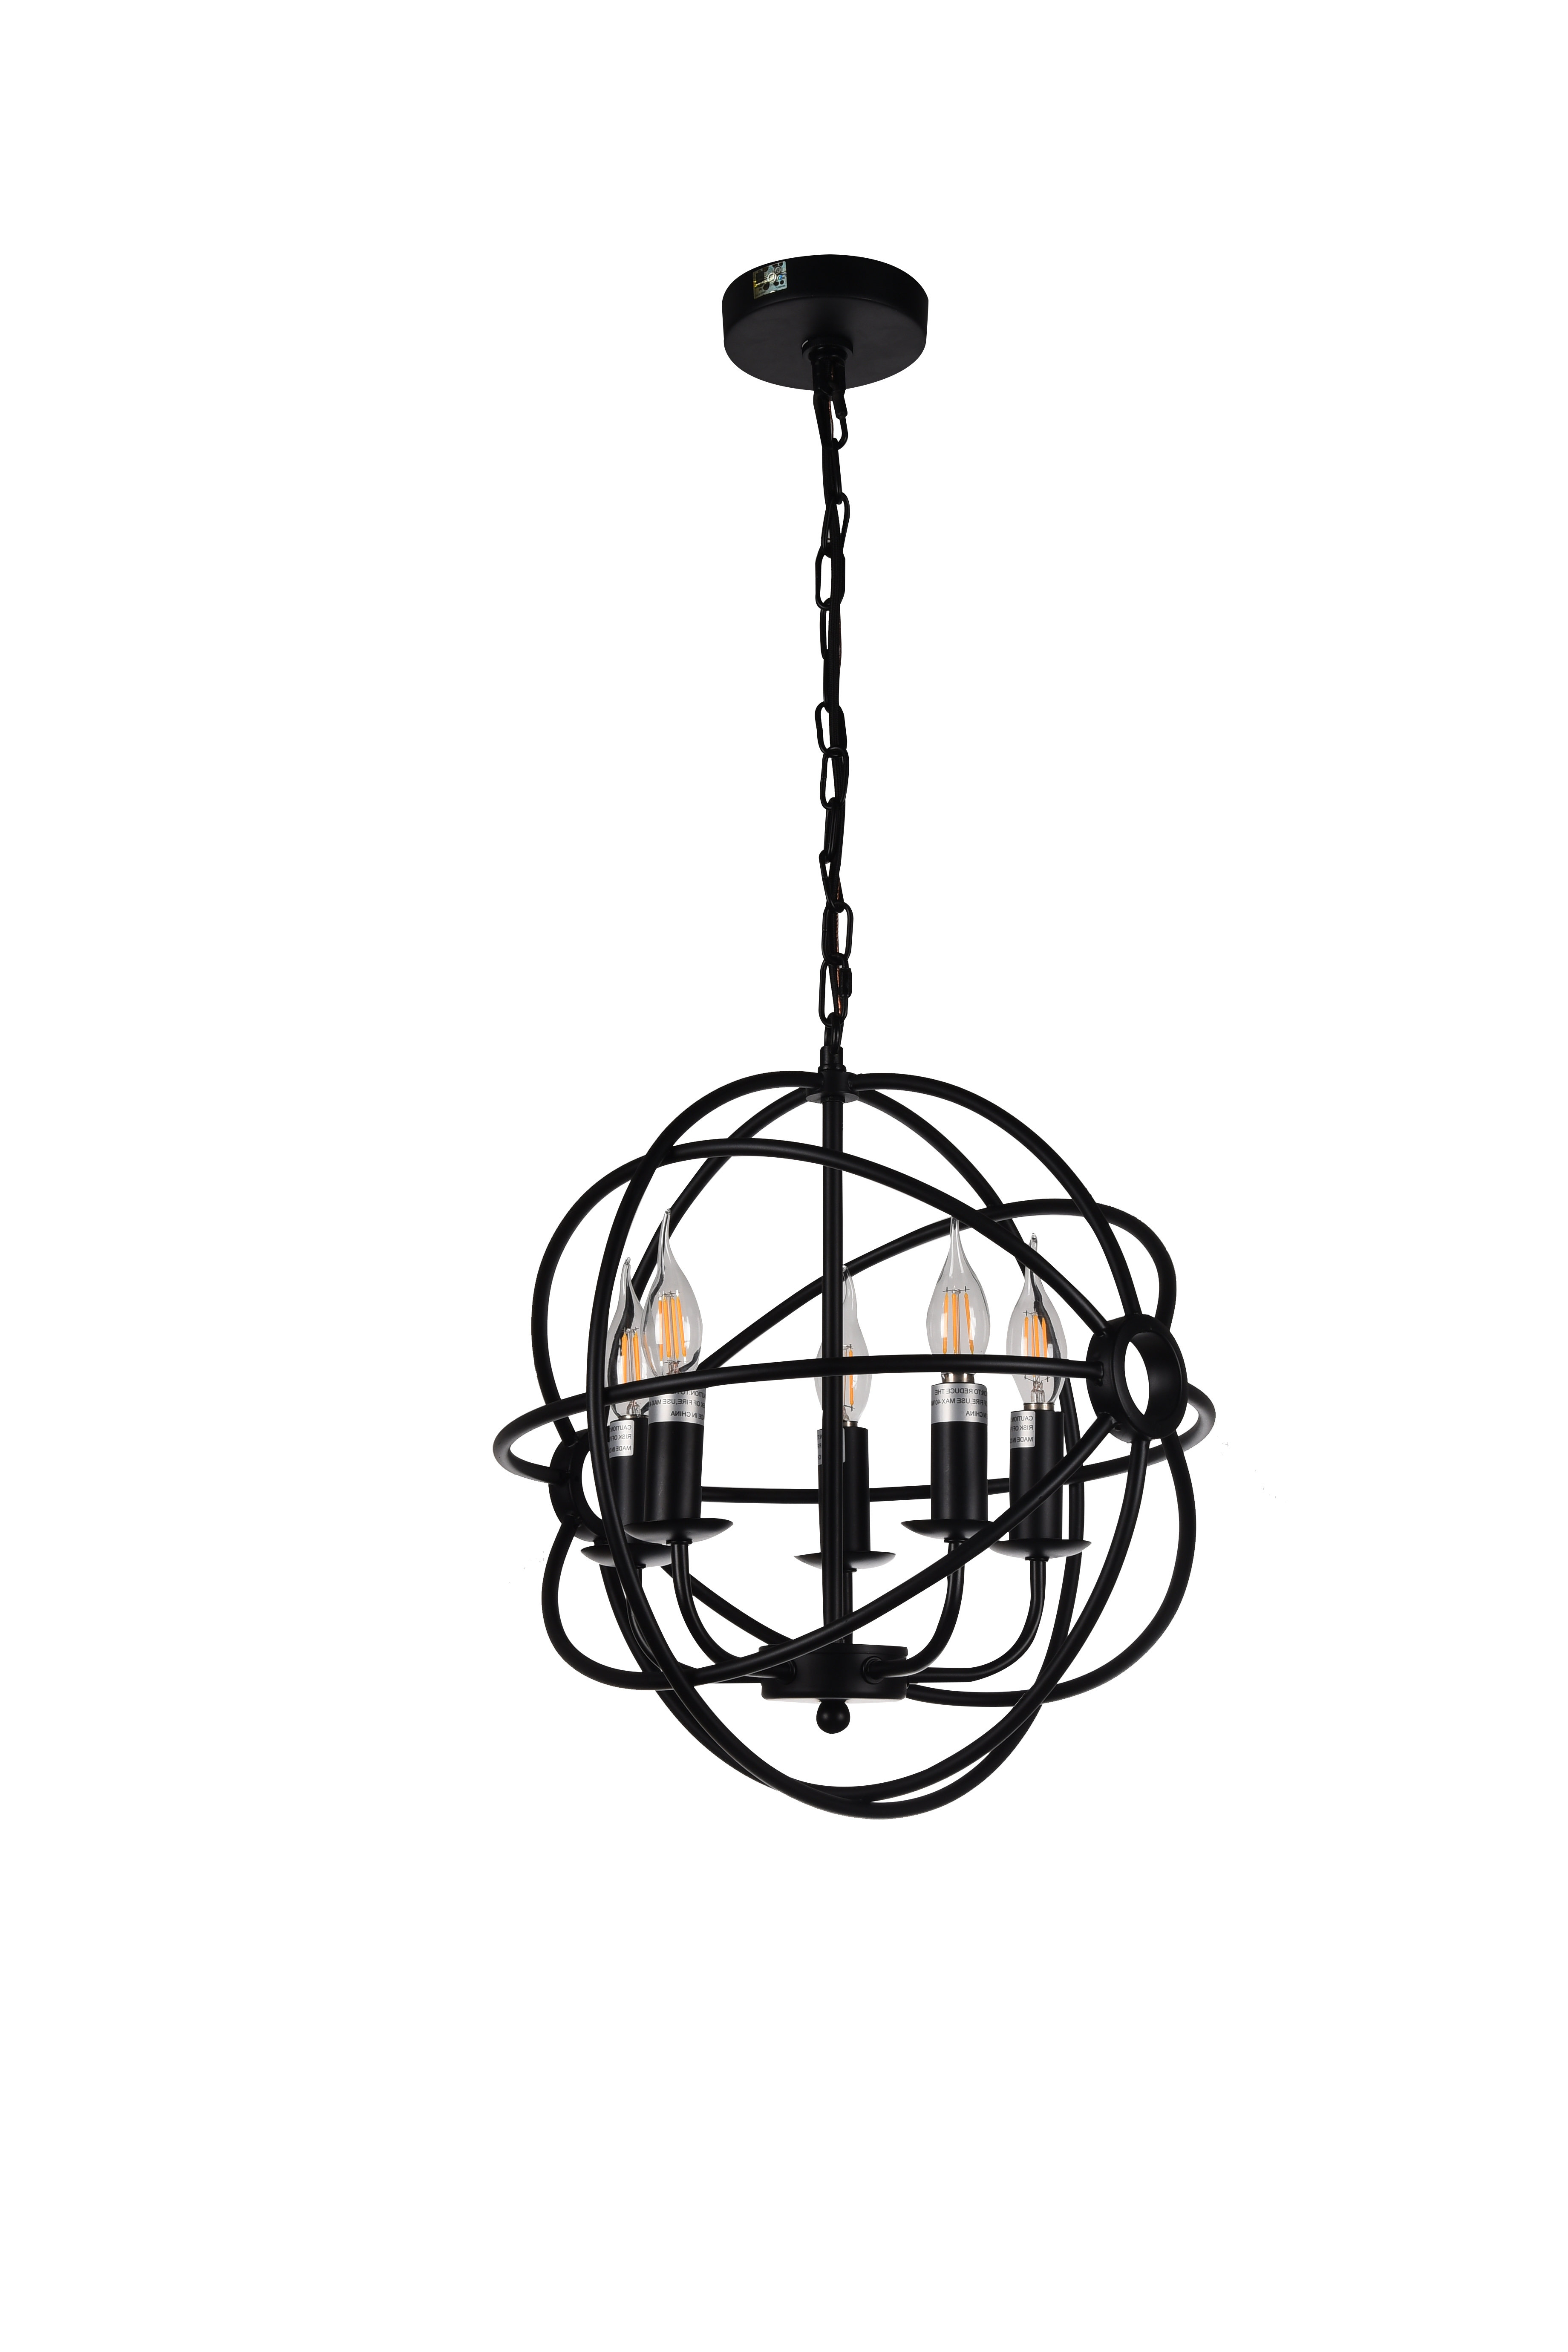 Famous Gaffney 5 Light Globe Chandelier Pertaining To Shipststour 3 Light Globe Chandeliers (View 7 of 25)